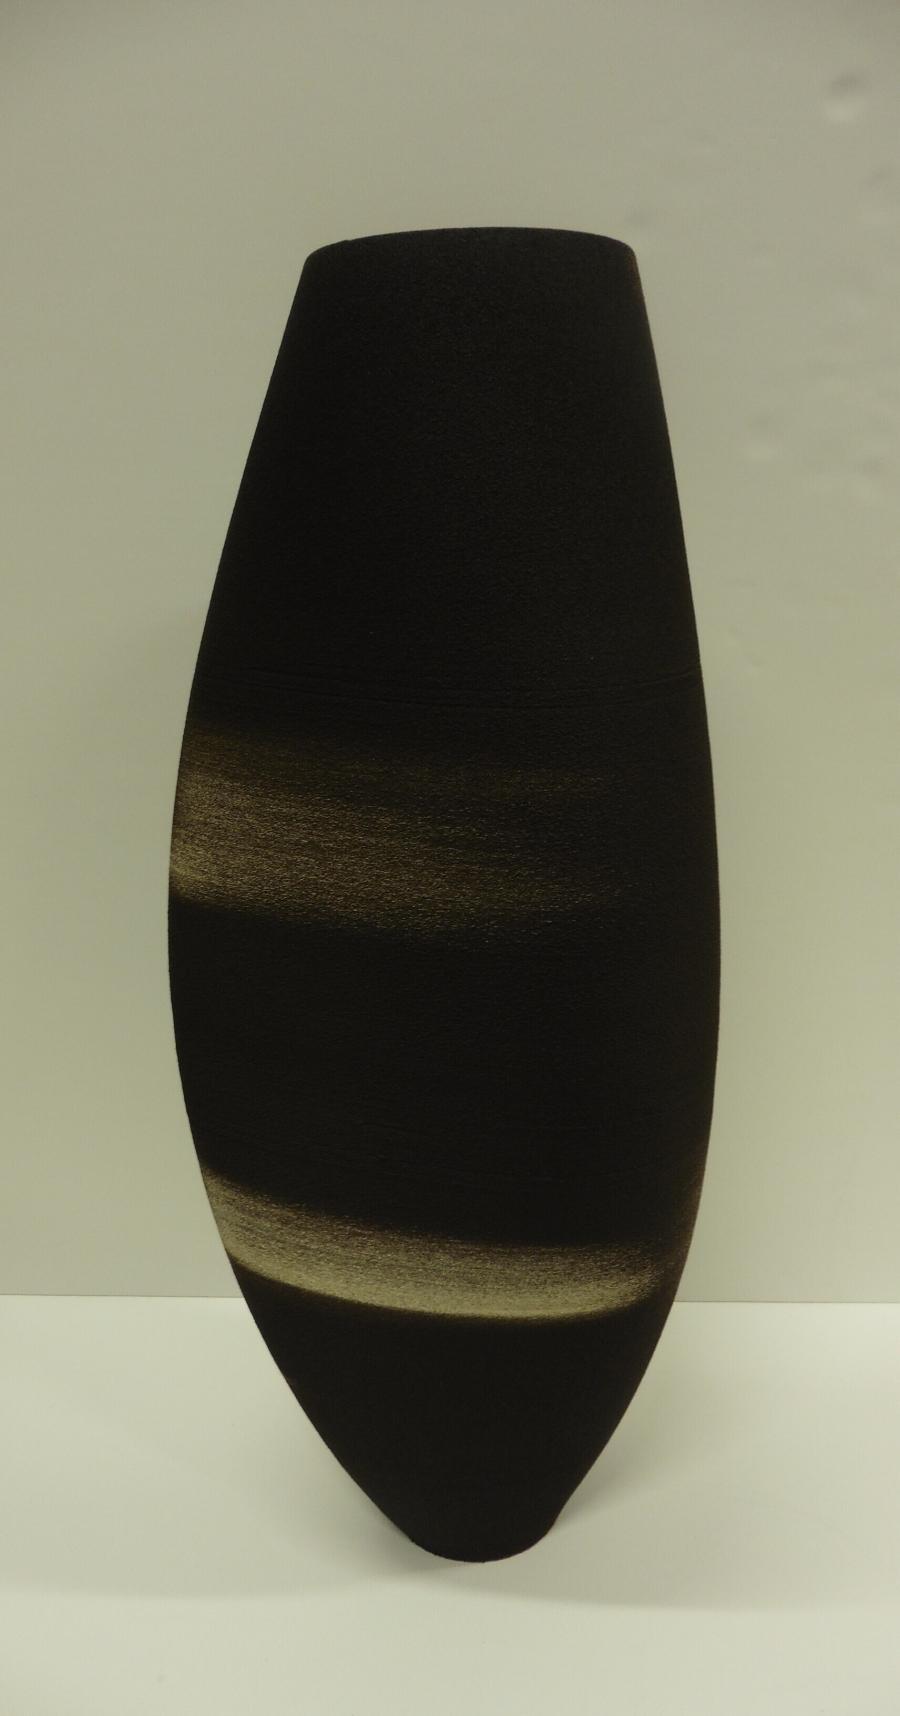 Pebble (Kiezelsteen)